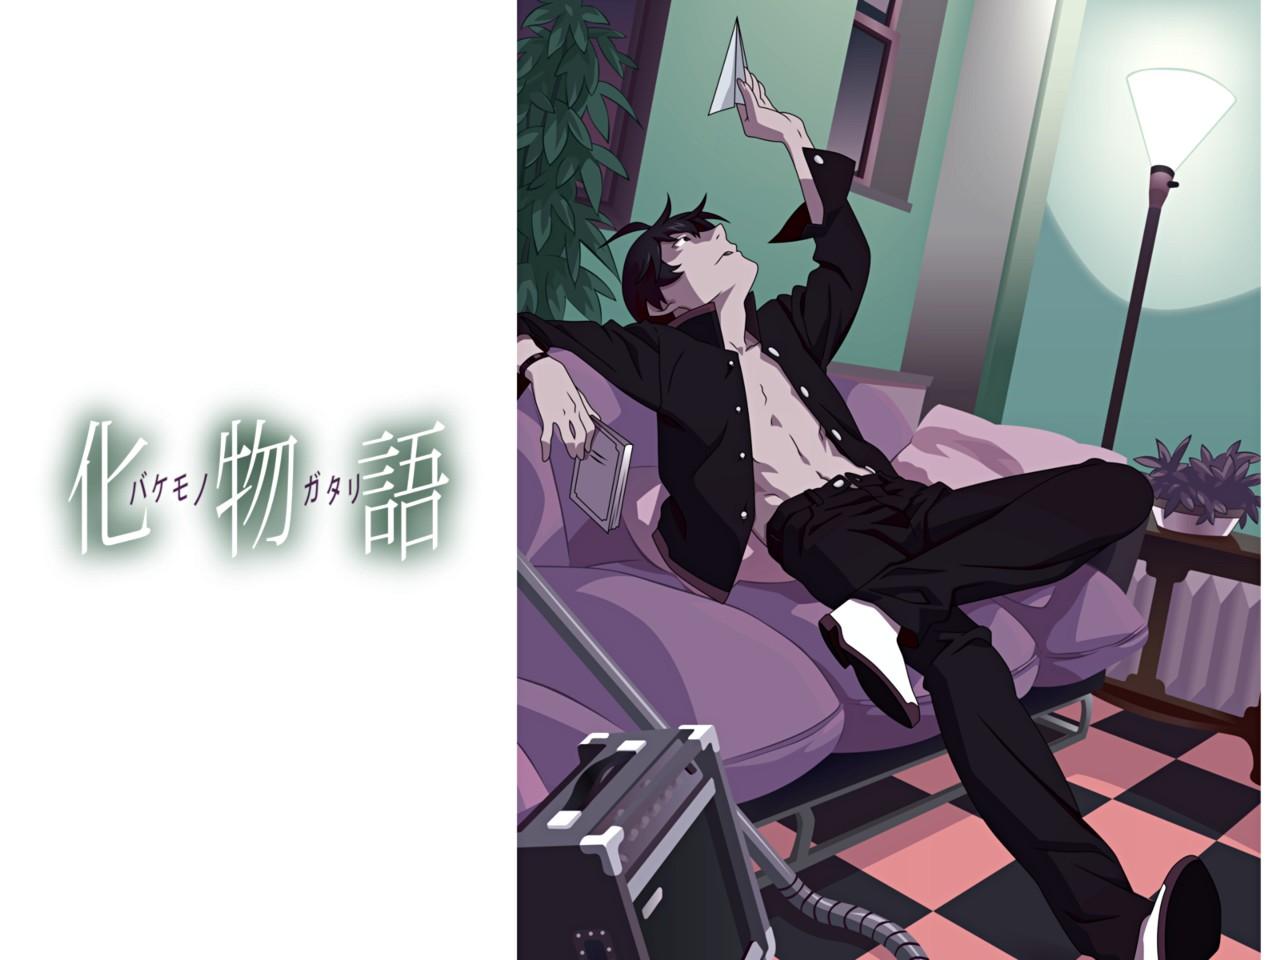 all_male araragi_koyomi bakemonogatari black_eyes black_hair book male monogatari_(series) open_shirt short_hair tagme_(artist)